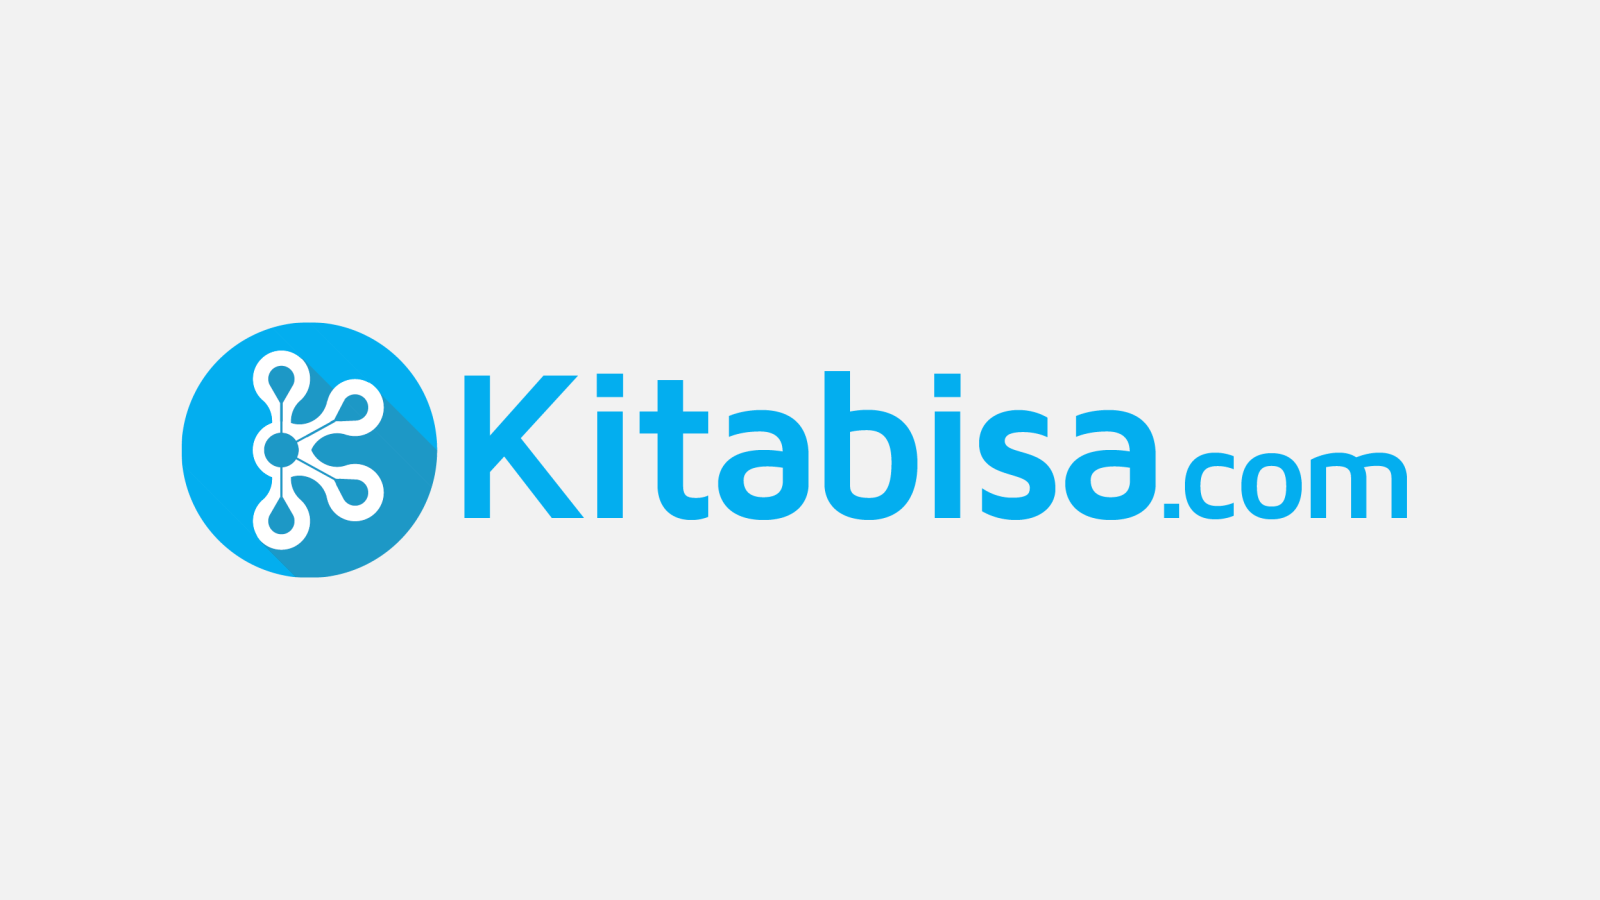 KitaBisa - KitaBisa dan Skutis Corporation Buat Indonesia Hijau Lagi